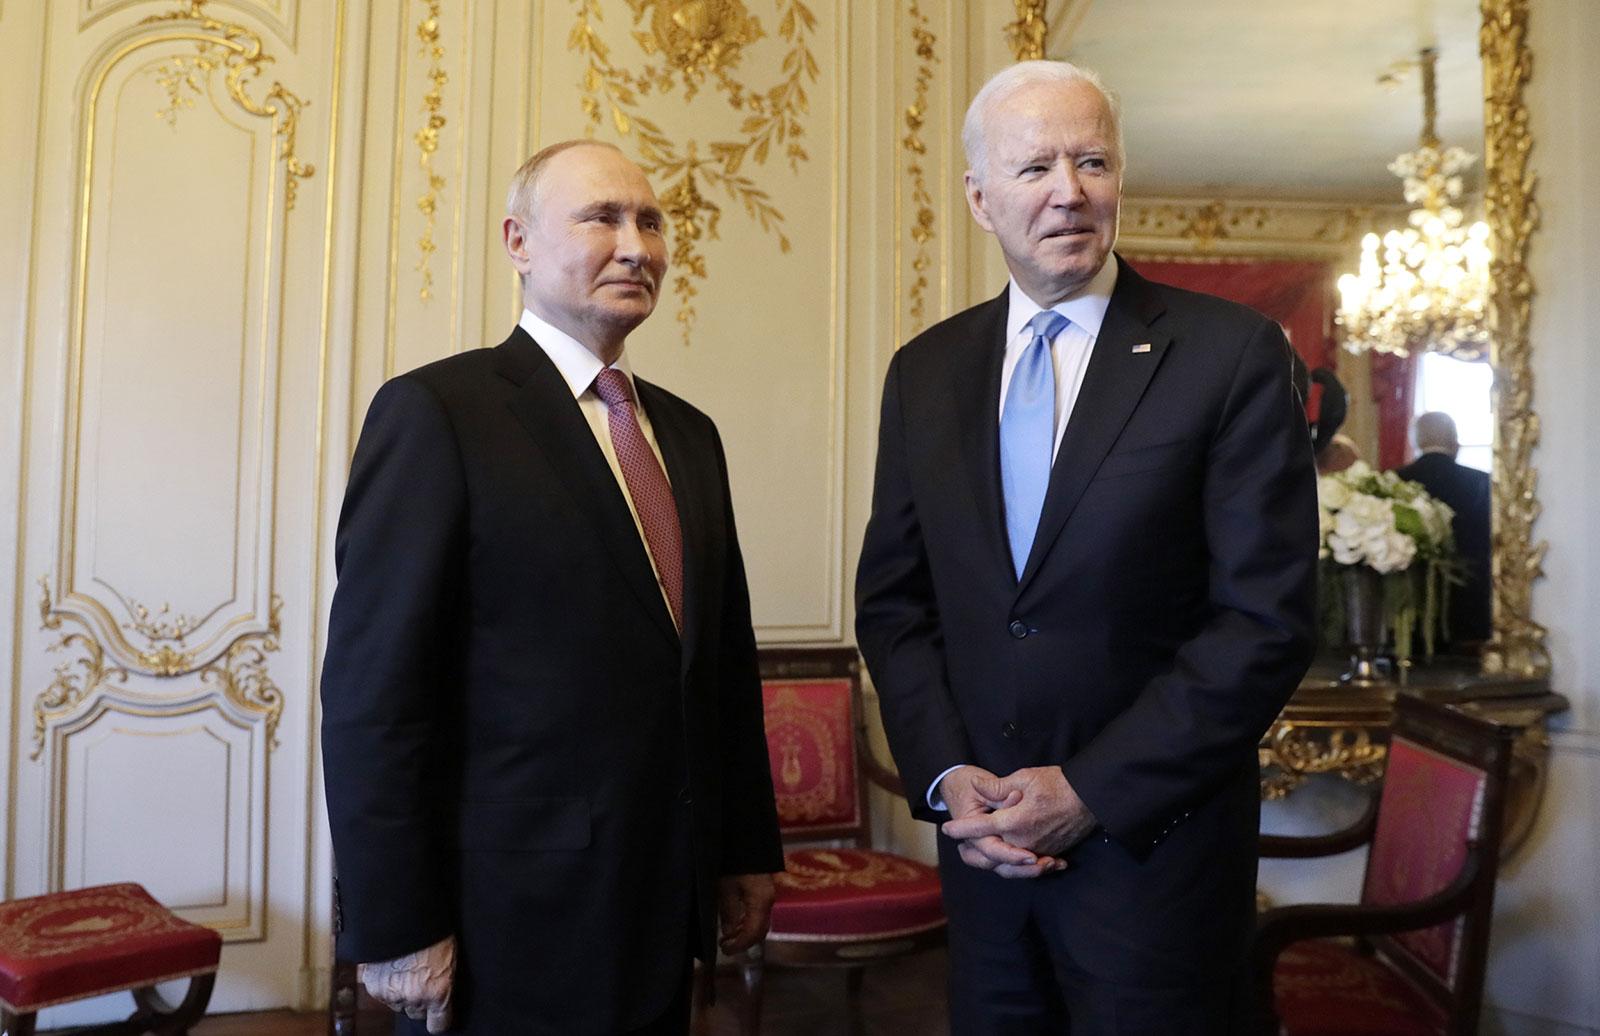 GENEVA, SWITZERLAND JUNE 16, 2021: Russia's President Vladimir Putin (L) and US President Joe Biden meet for talks at the Villa La Grange. Mikhail Metzel/TASS (Photo by Mikhail MetzelTASS via Getty Images)